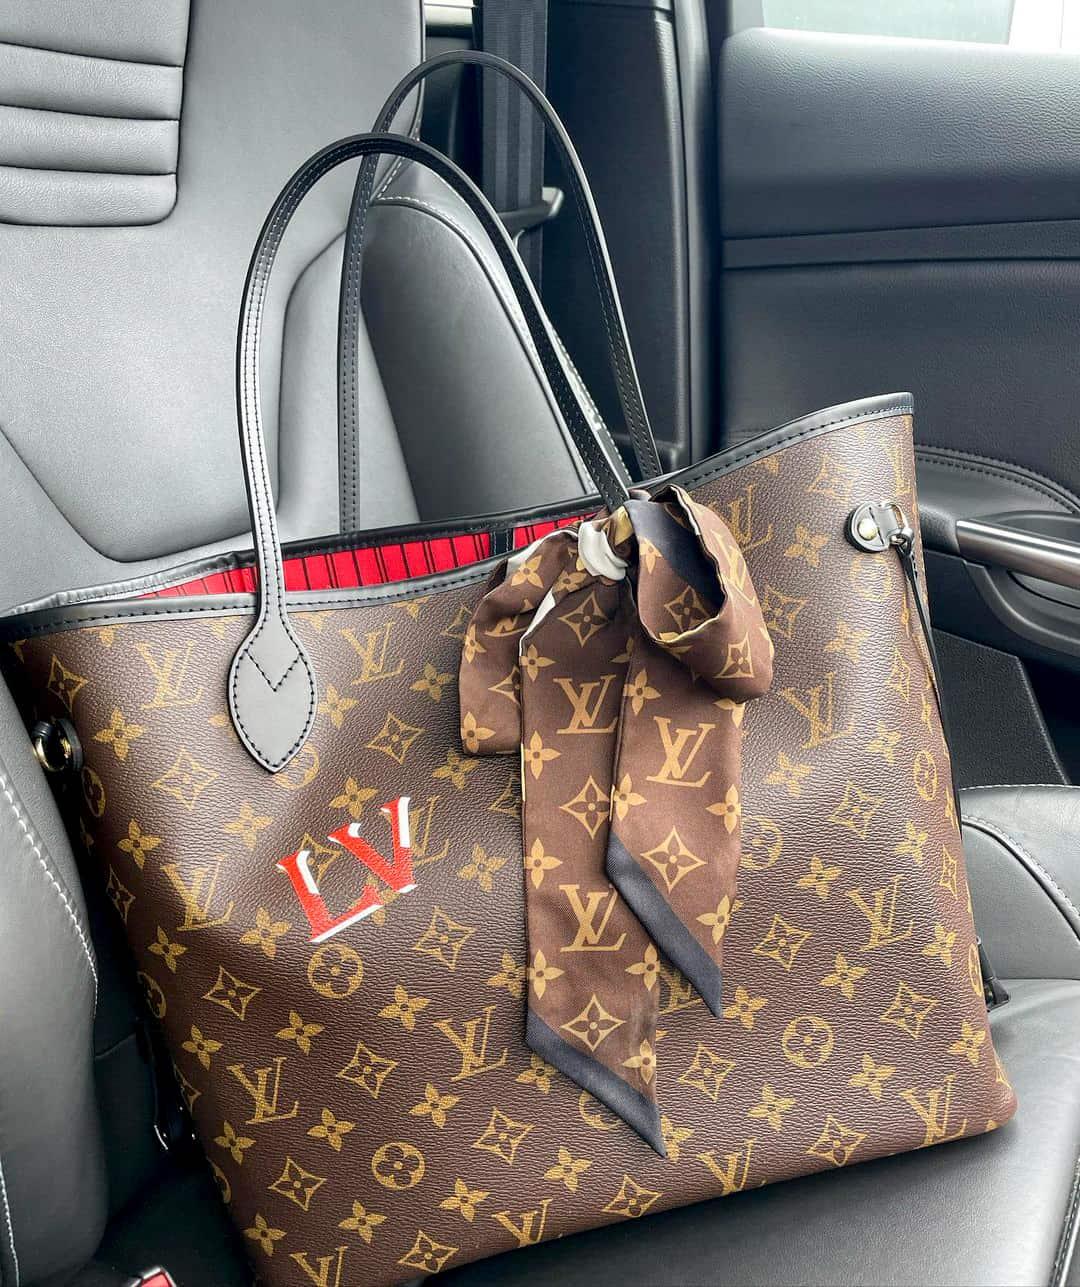 Louis Vuitton Neverfull designer tote bag